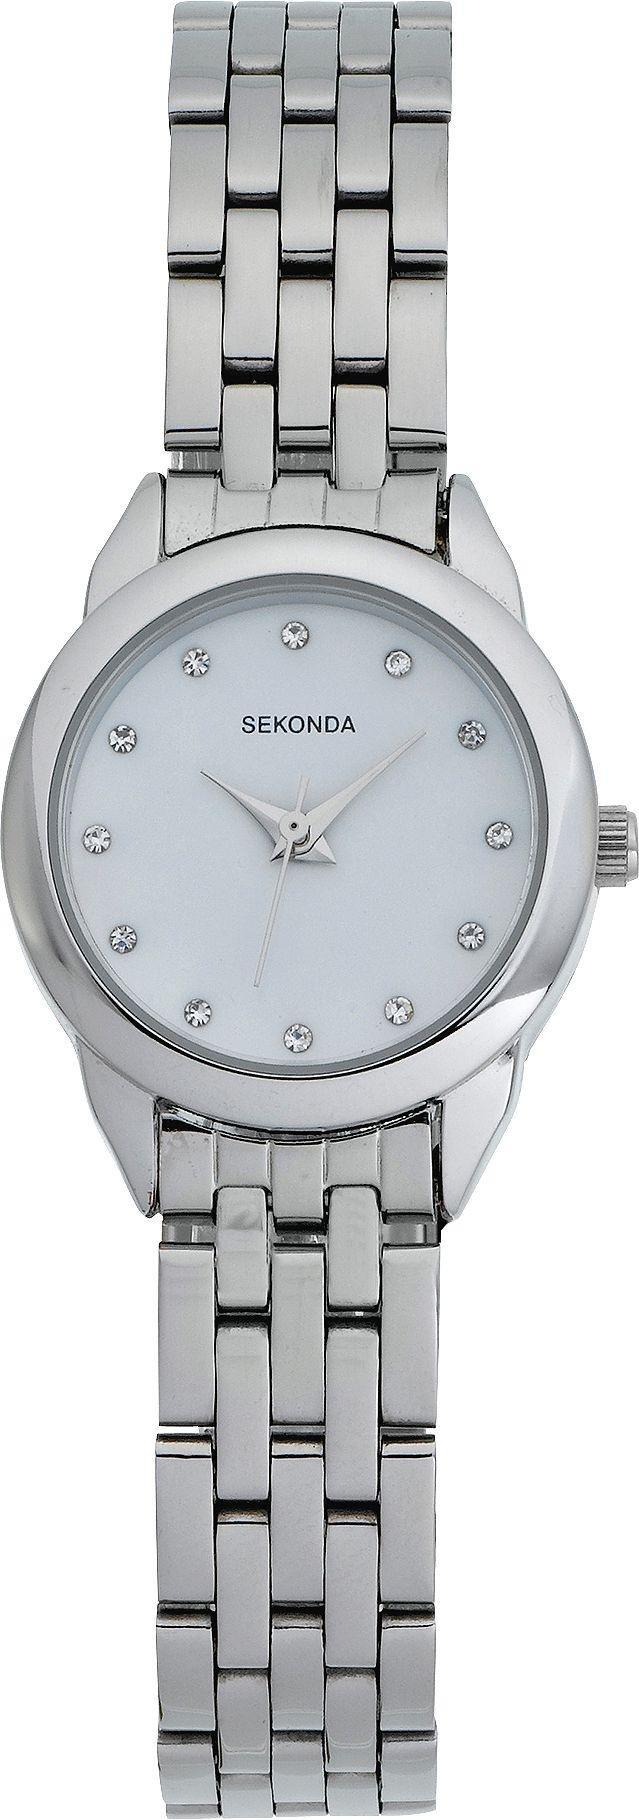 Buy Sekonda La s Stone Set Bracelet Watch at Argos Your